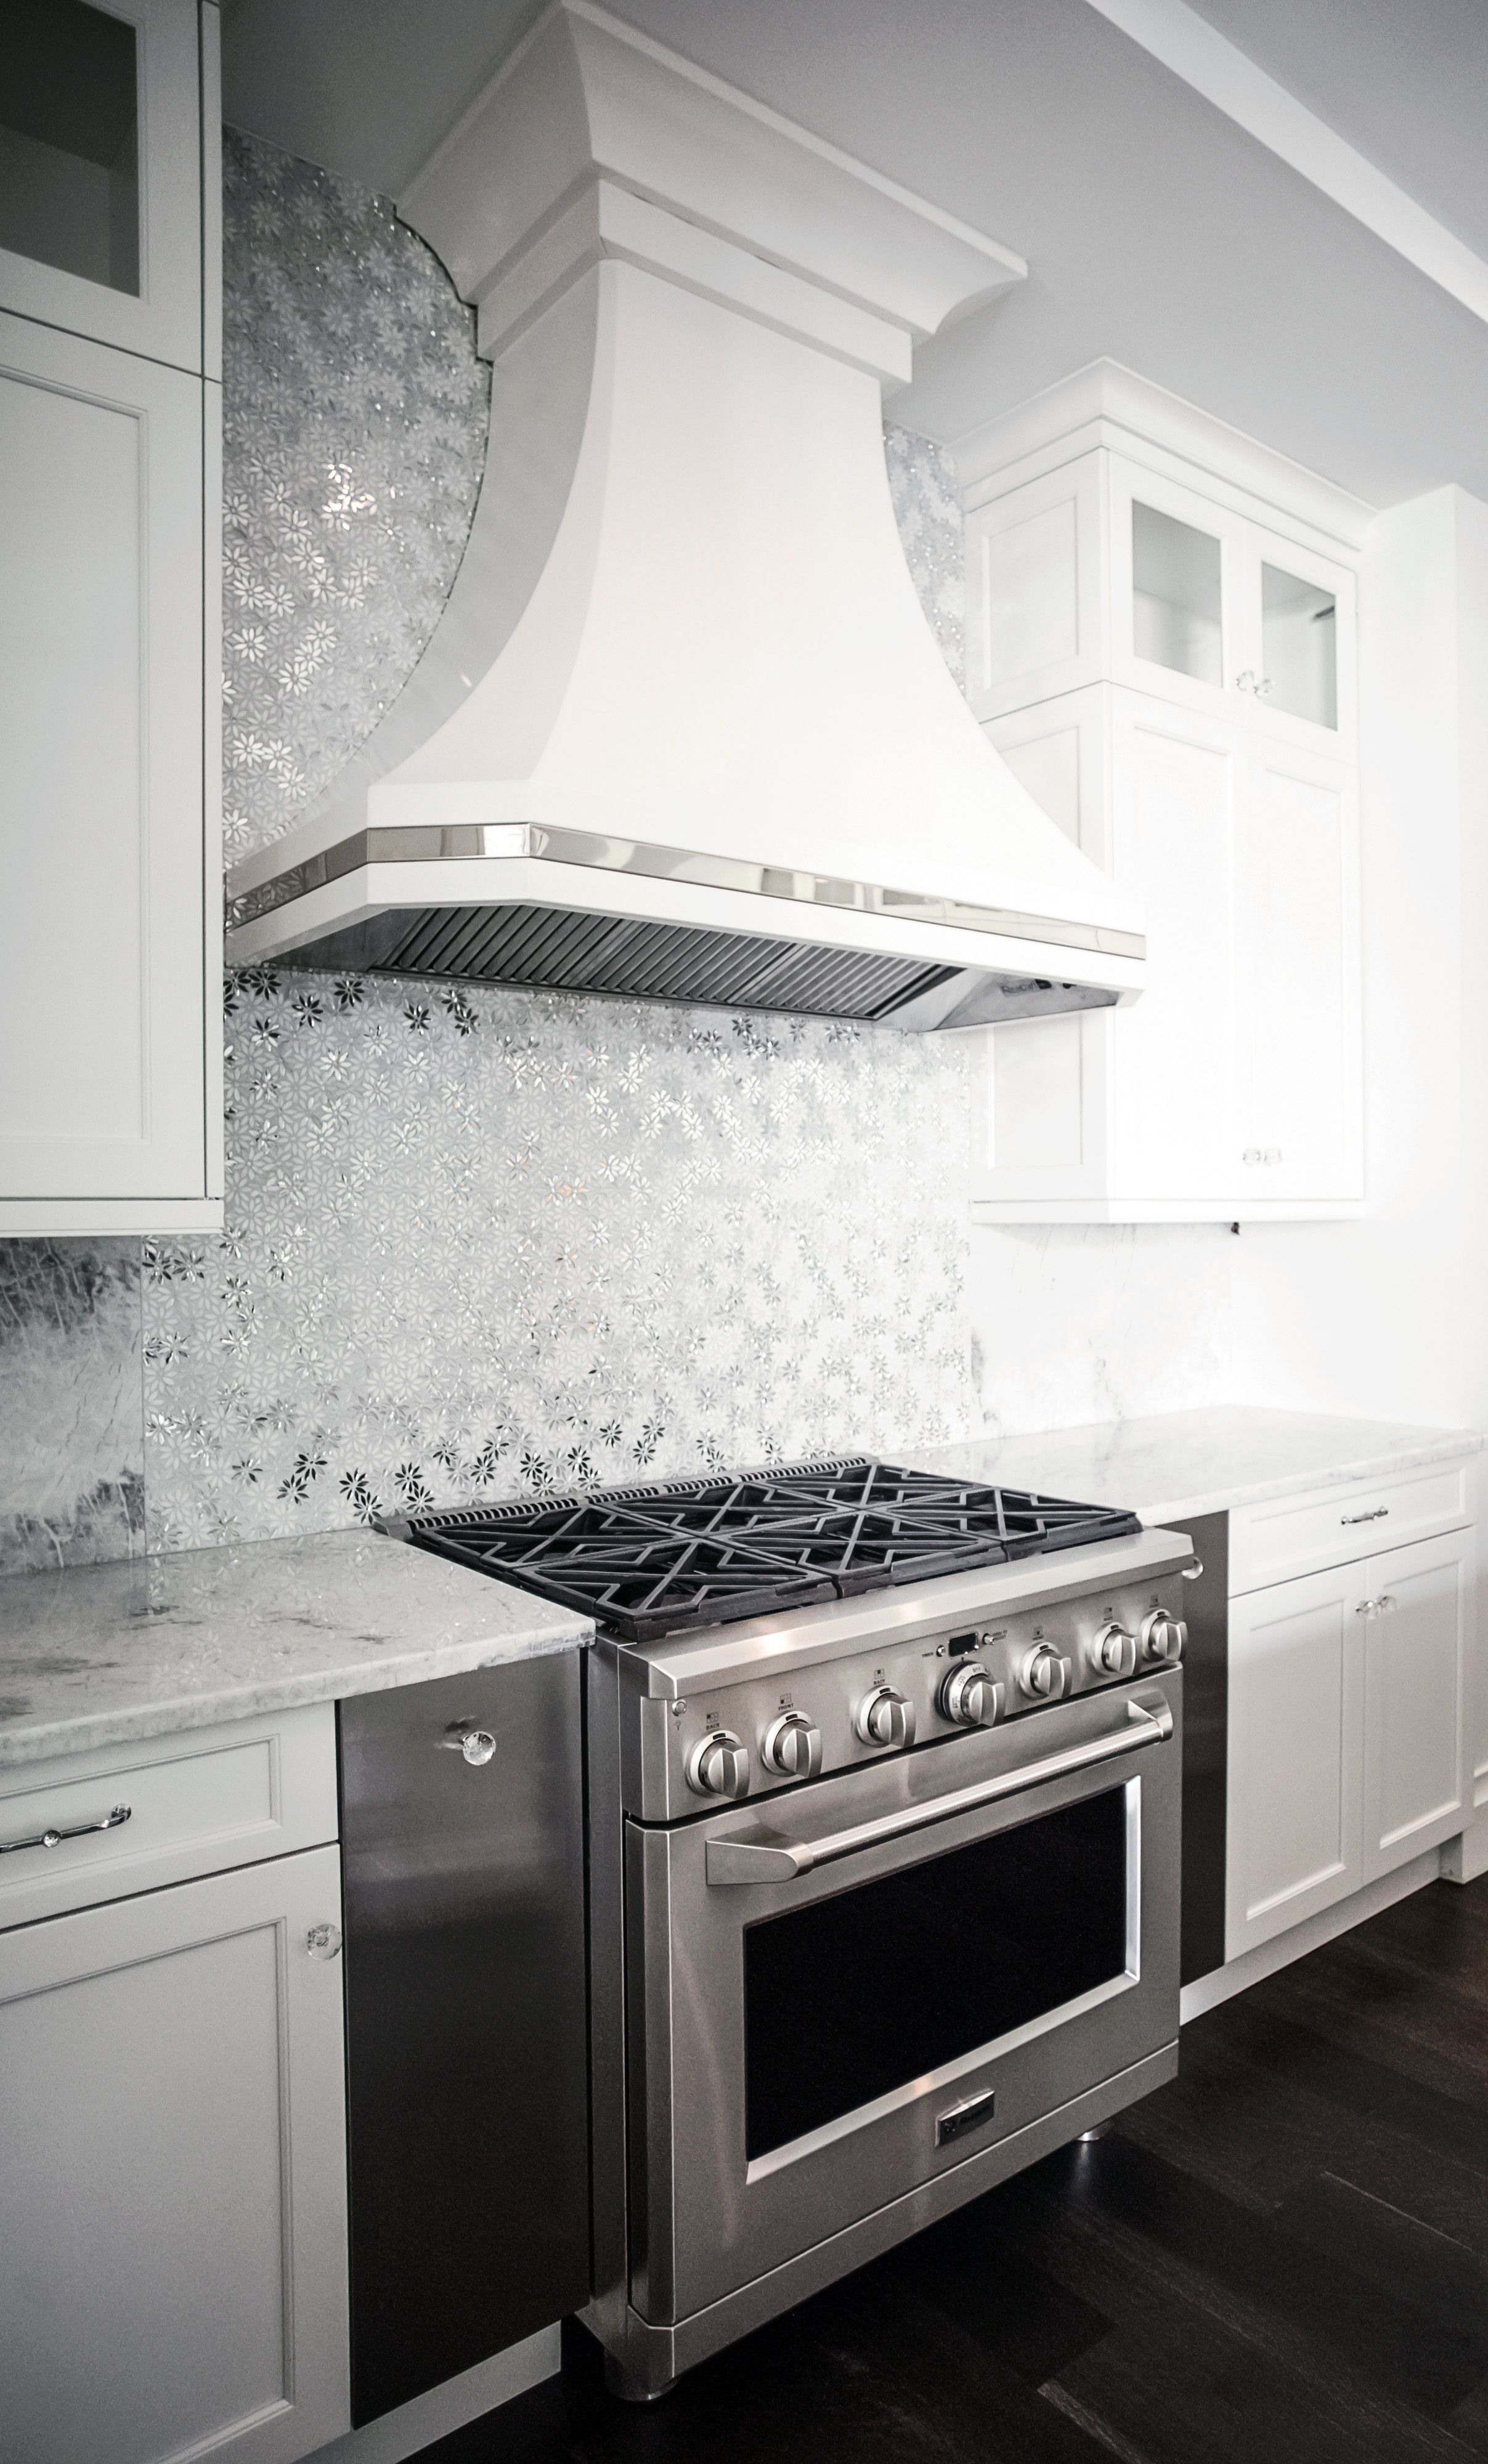 Artistic Tile I Dapper Daisy Mosaic In White Silver Illuminates